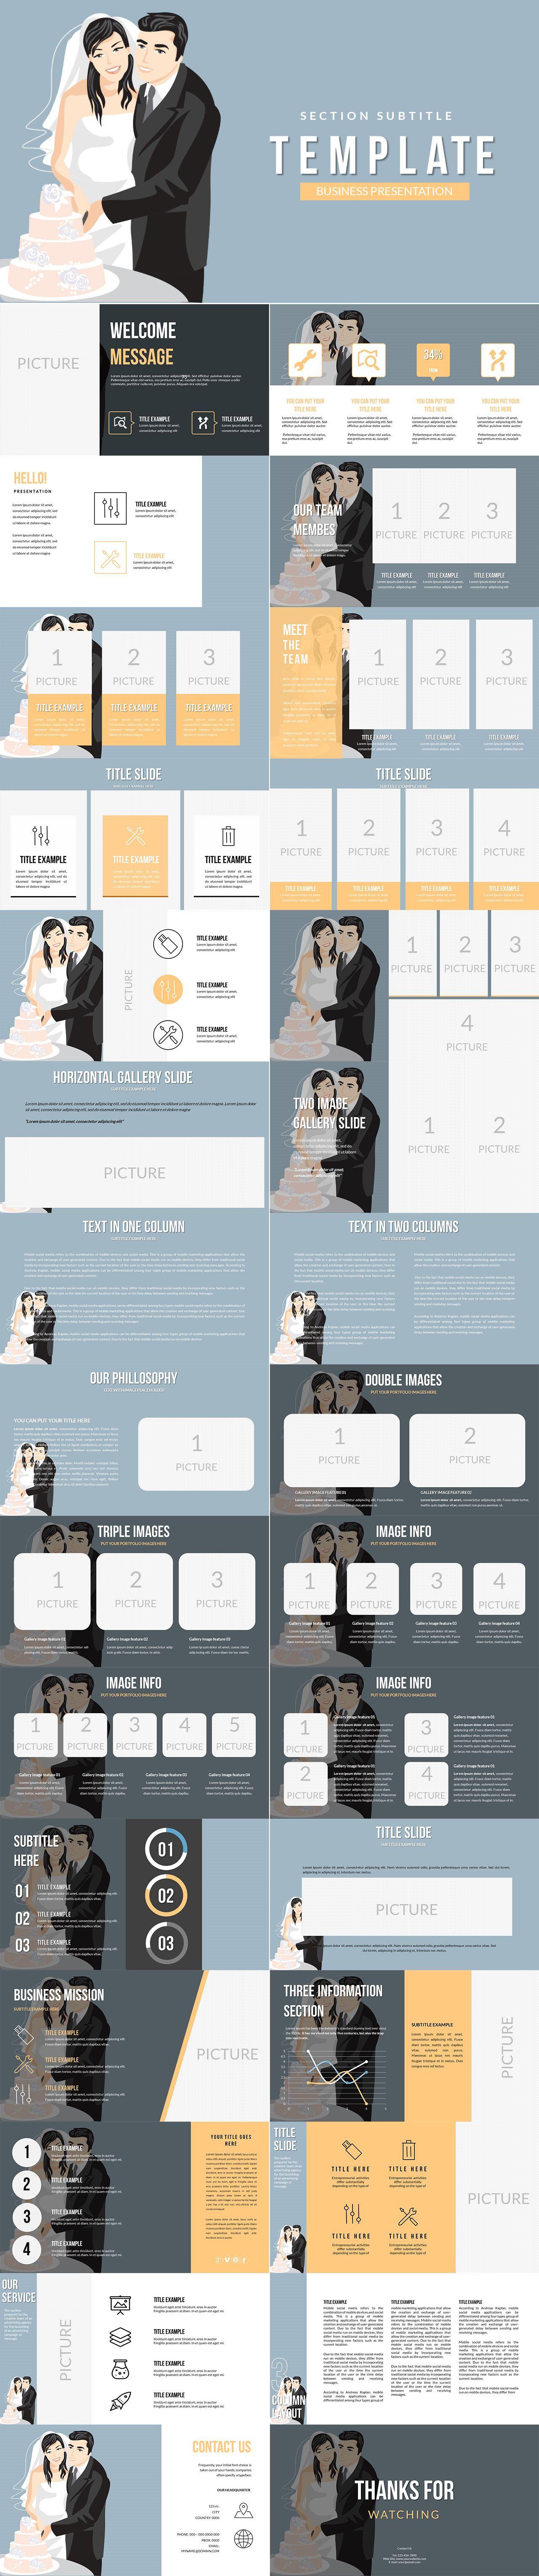 wedding anniversary powerpoint templates powerpoint templates